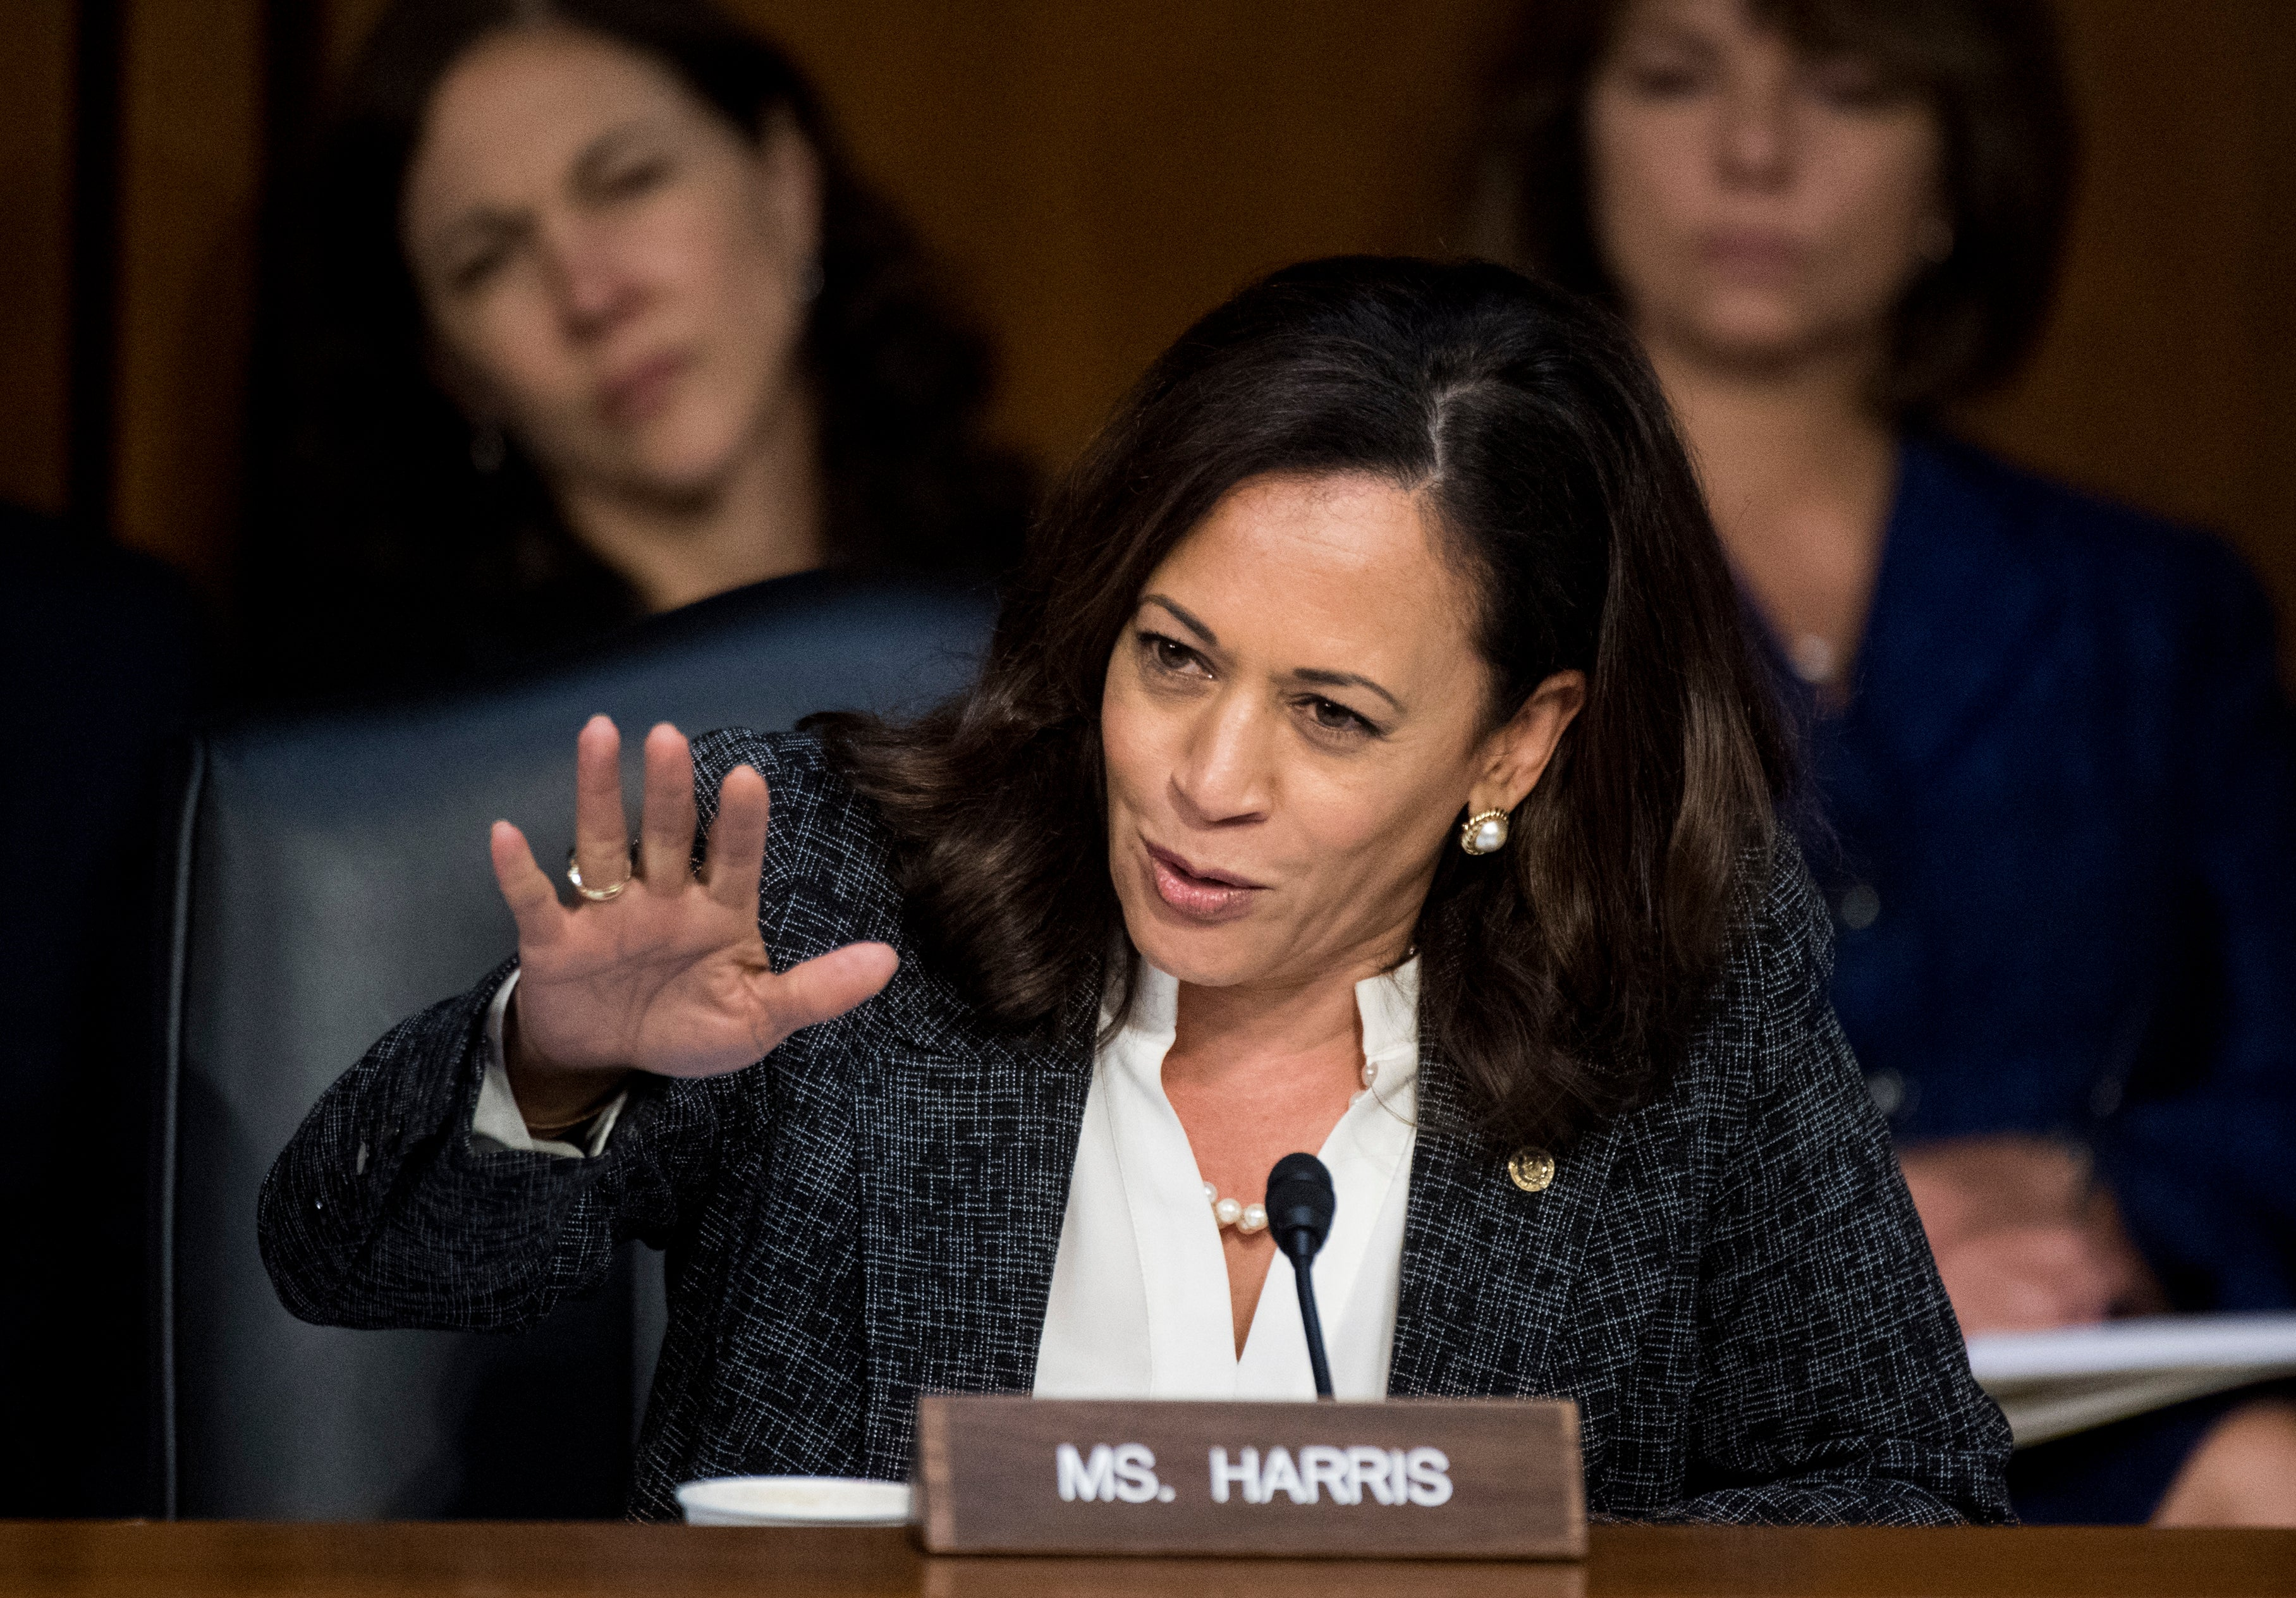 Sen. Kamala Harris On 2020 Election: 'It's Going To Be Ugly'